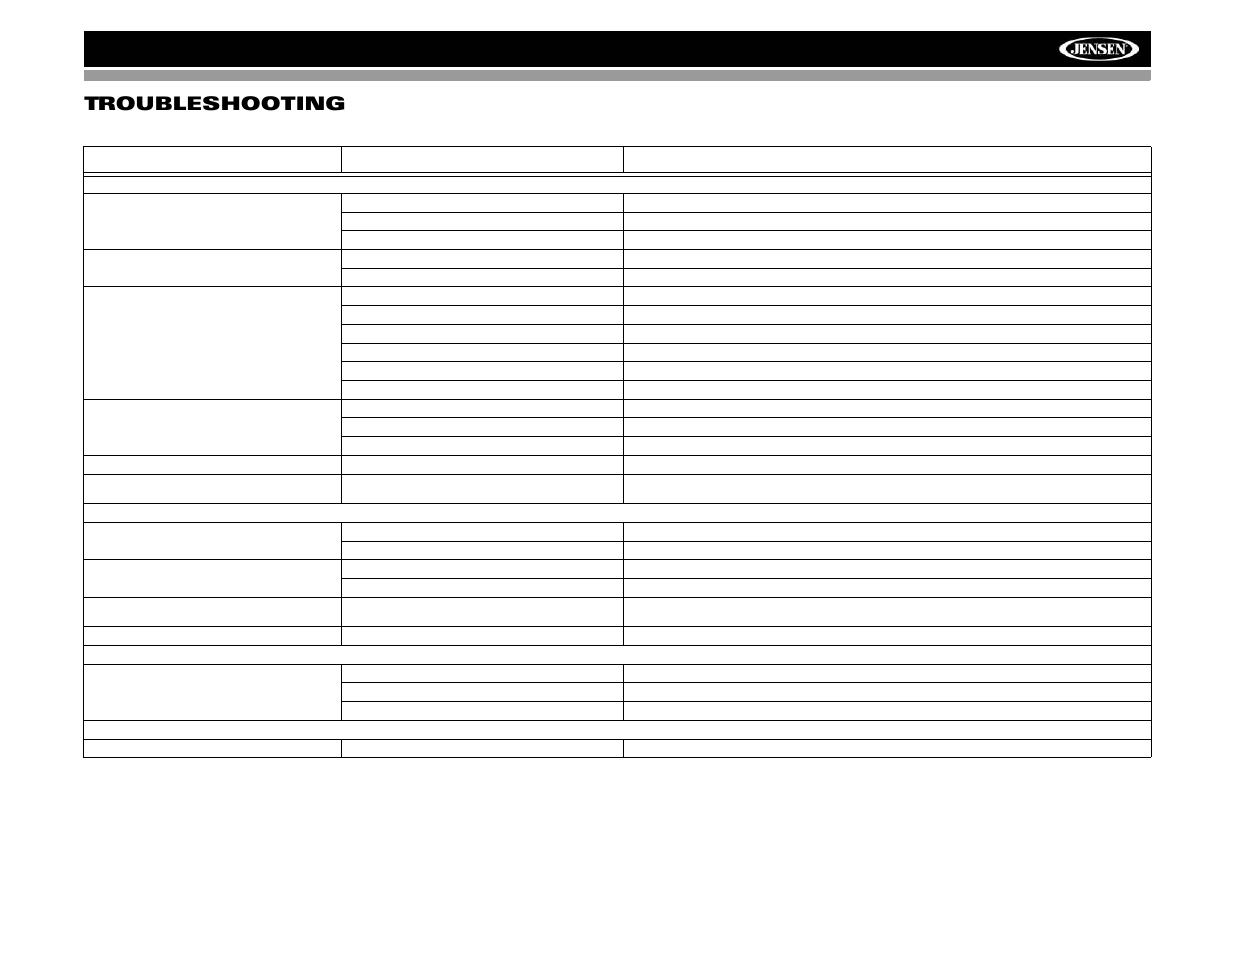 Vm9022 troubleshooting | Jensen VM9022 User Manual | Page 39 ... on jensen car audio, jvc car audio wiring diagram, jensen marine stereo wiring diagram, jensen car speakers, jensen car stereo remote control, jensen car stereo manuals,